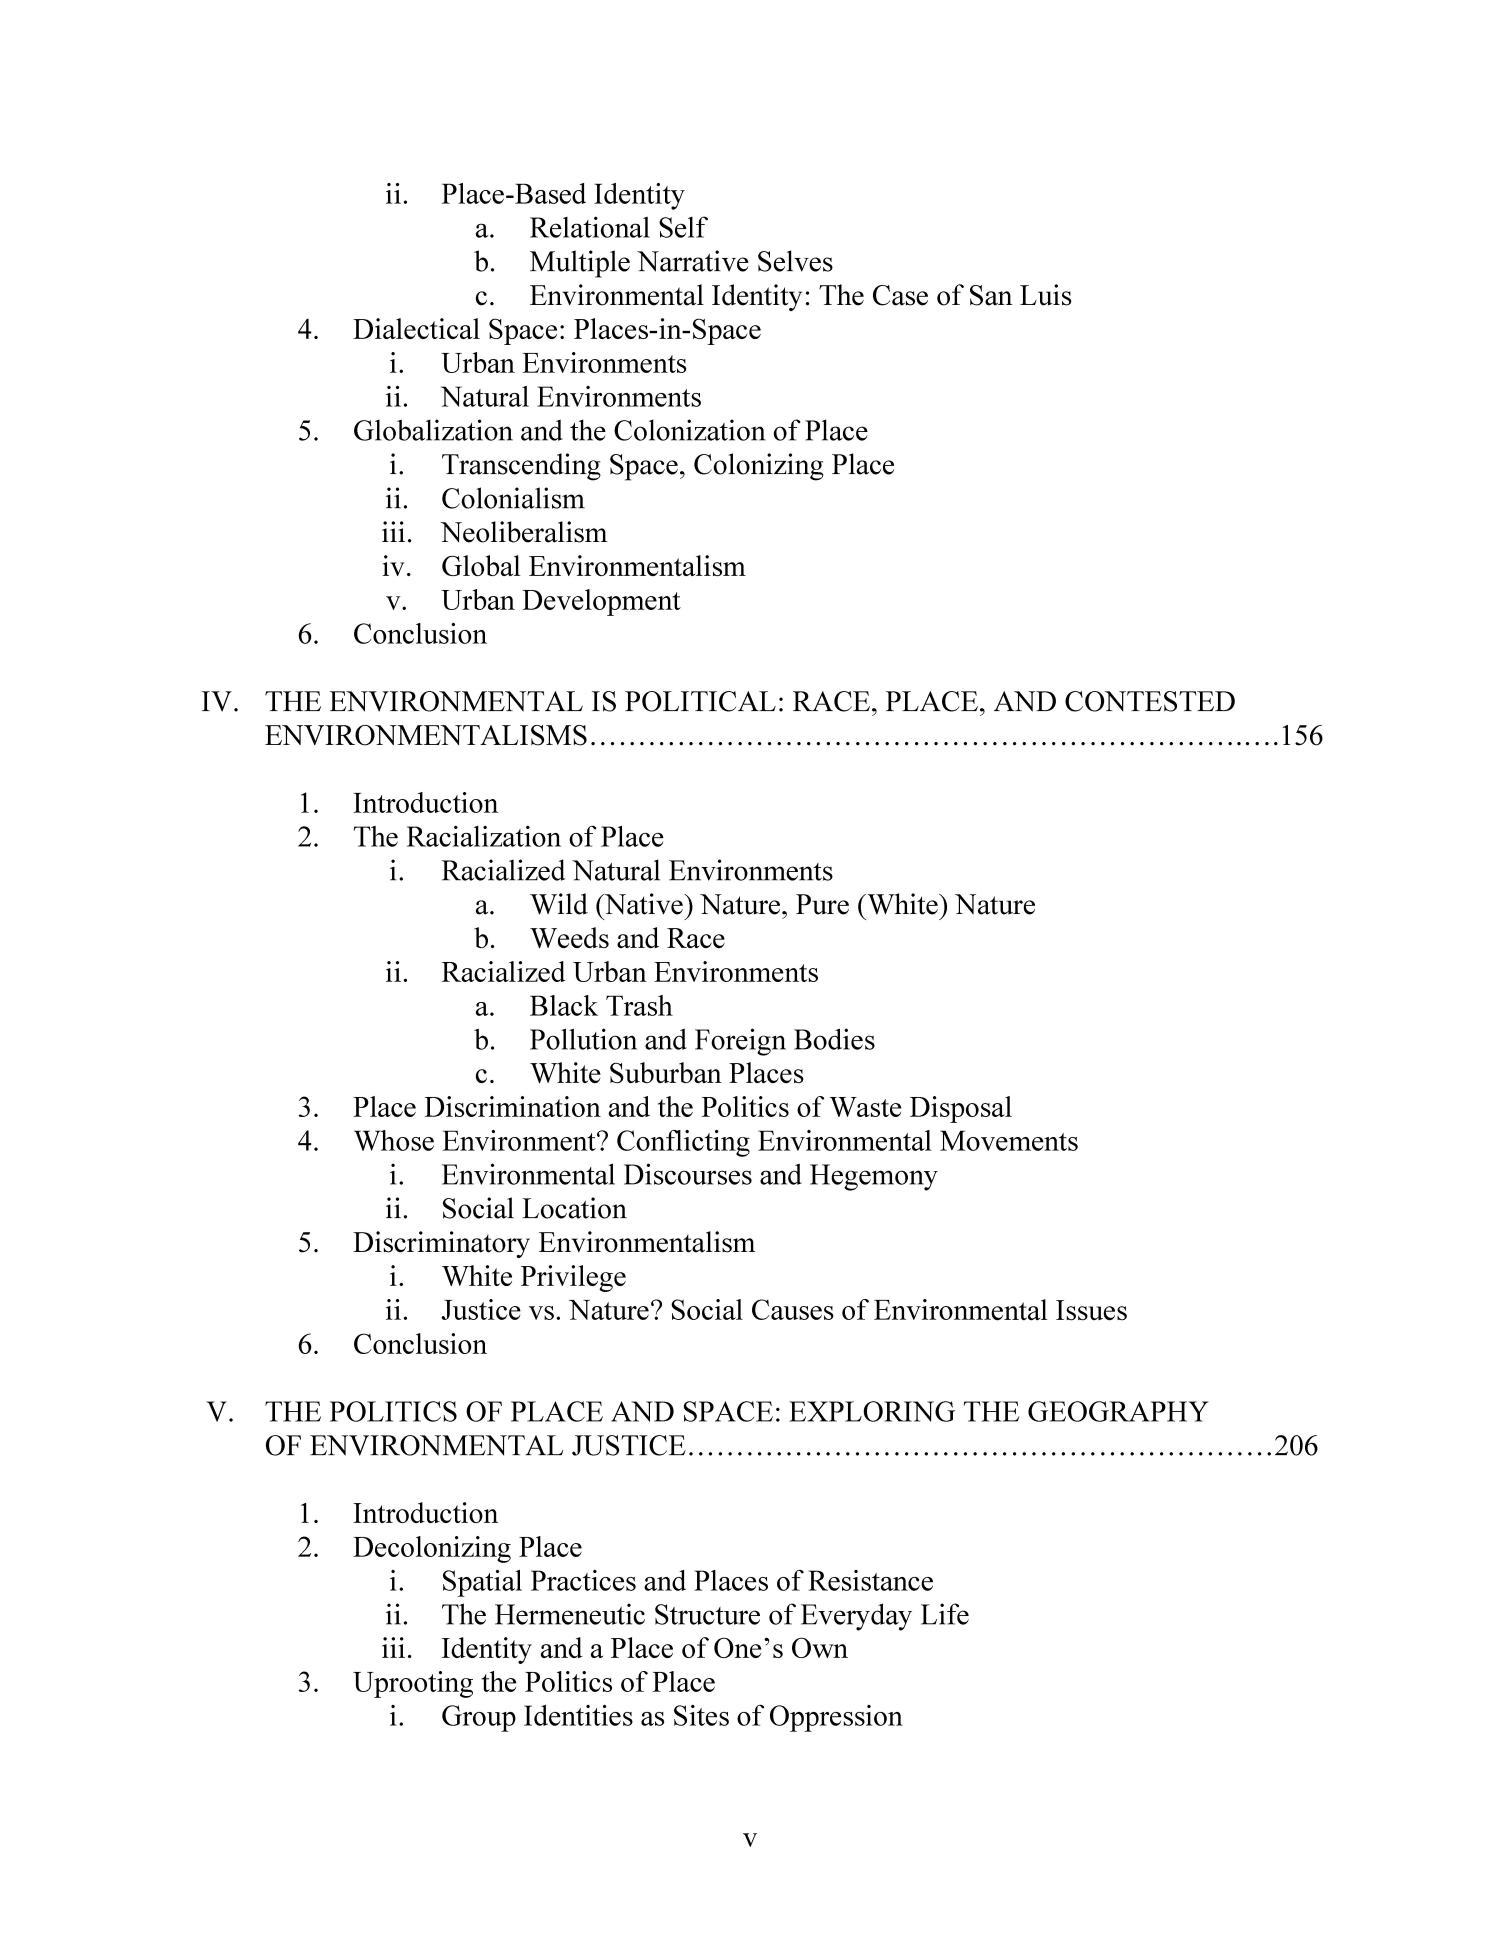 Environmental politics phd thesis